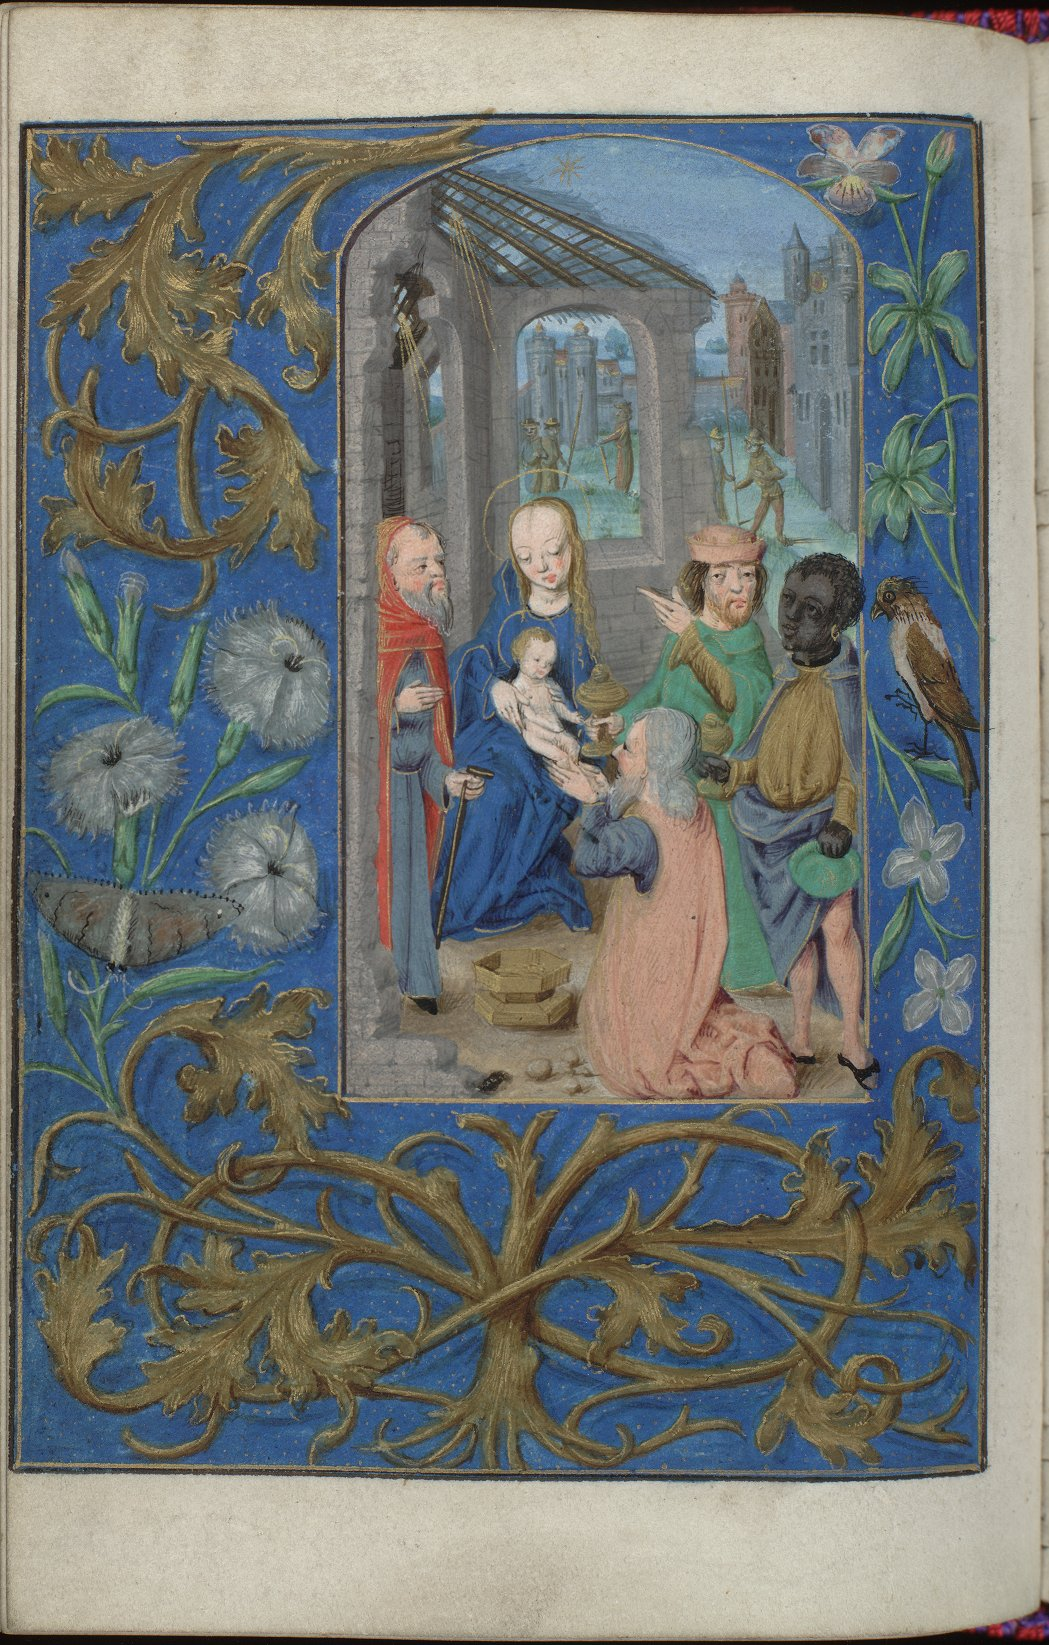 Book of Hours: Flanders